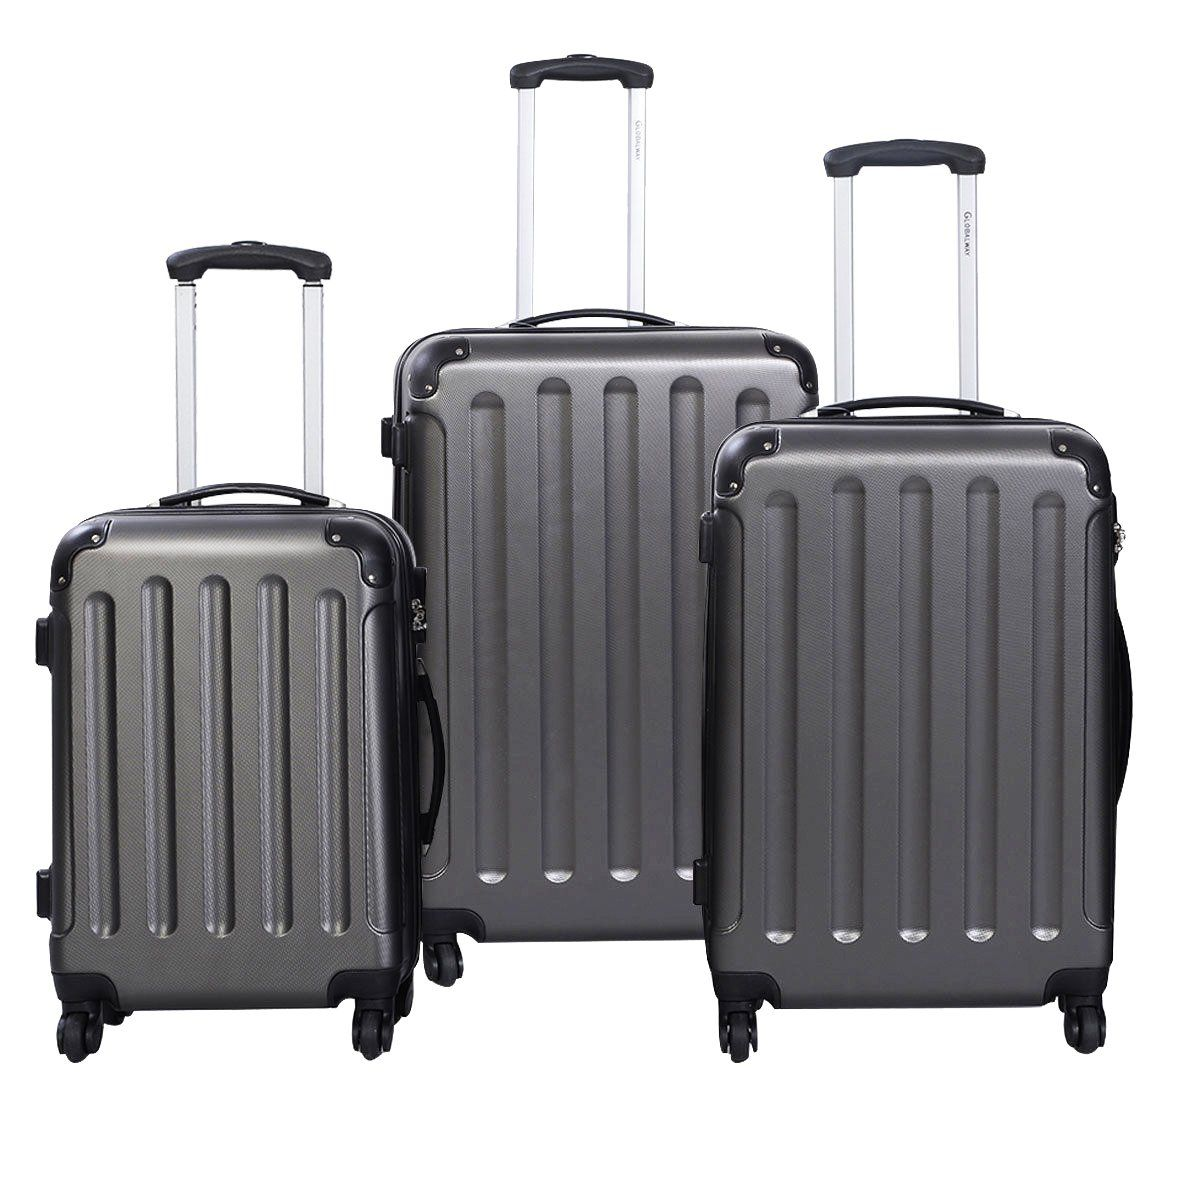 4f27595ff90f Luggage Sets On Sale 3 Pcs Trolley Wheels Portable Suitcase Travel Bag Set